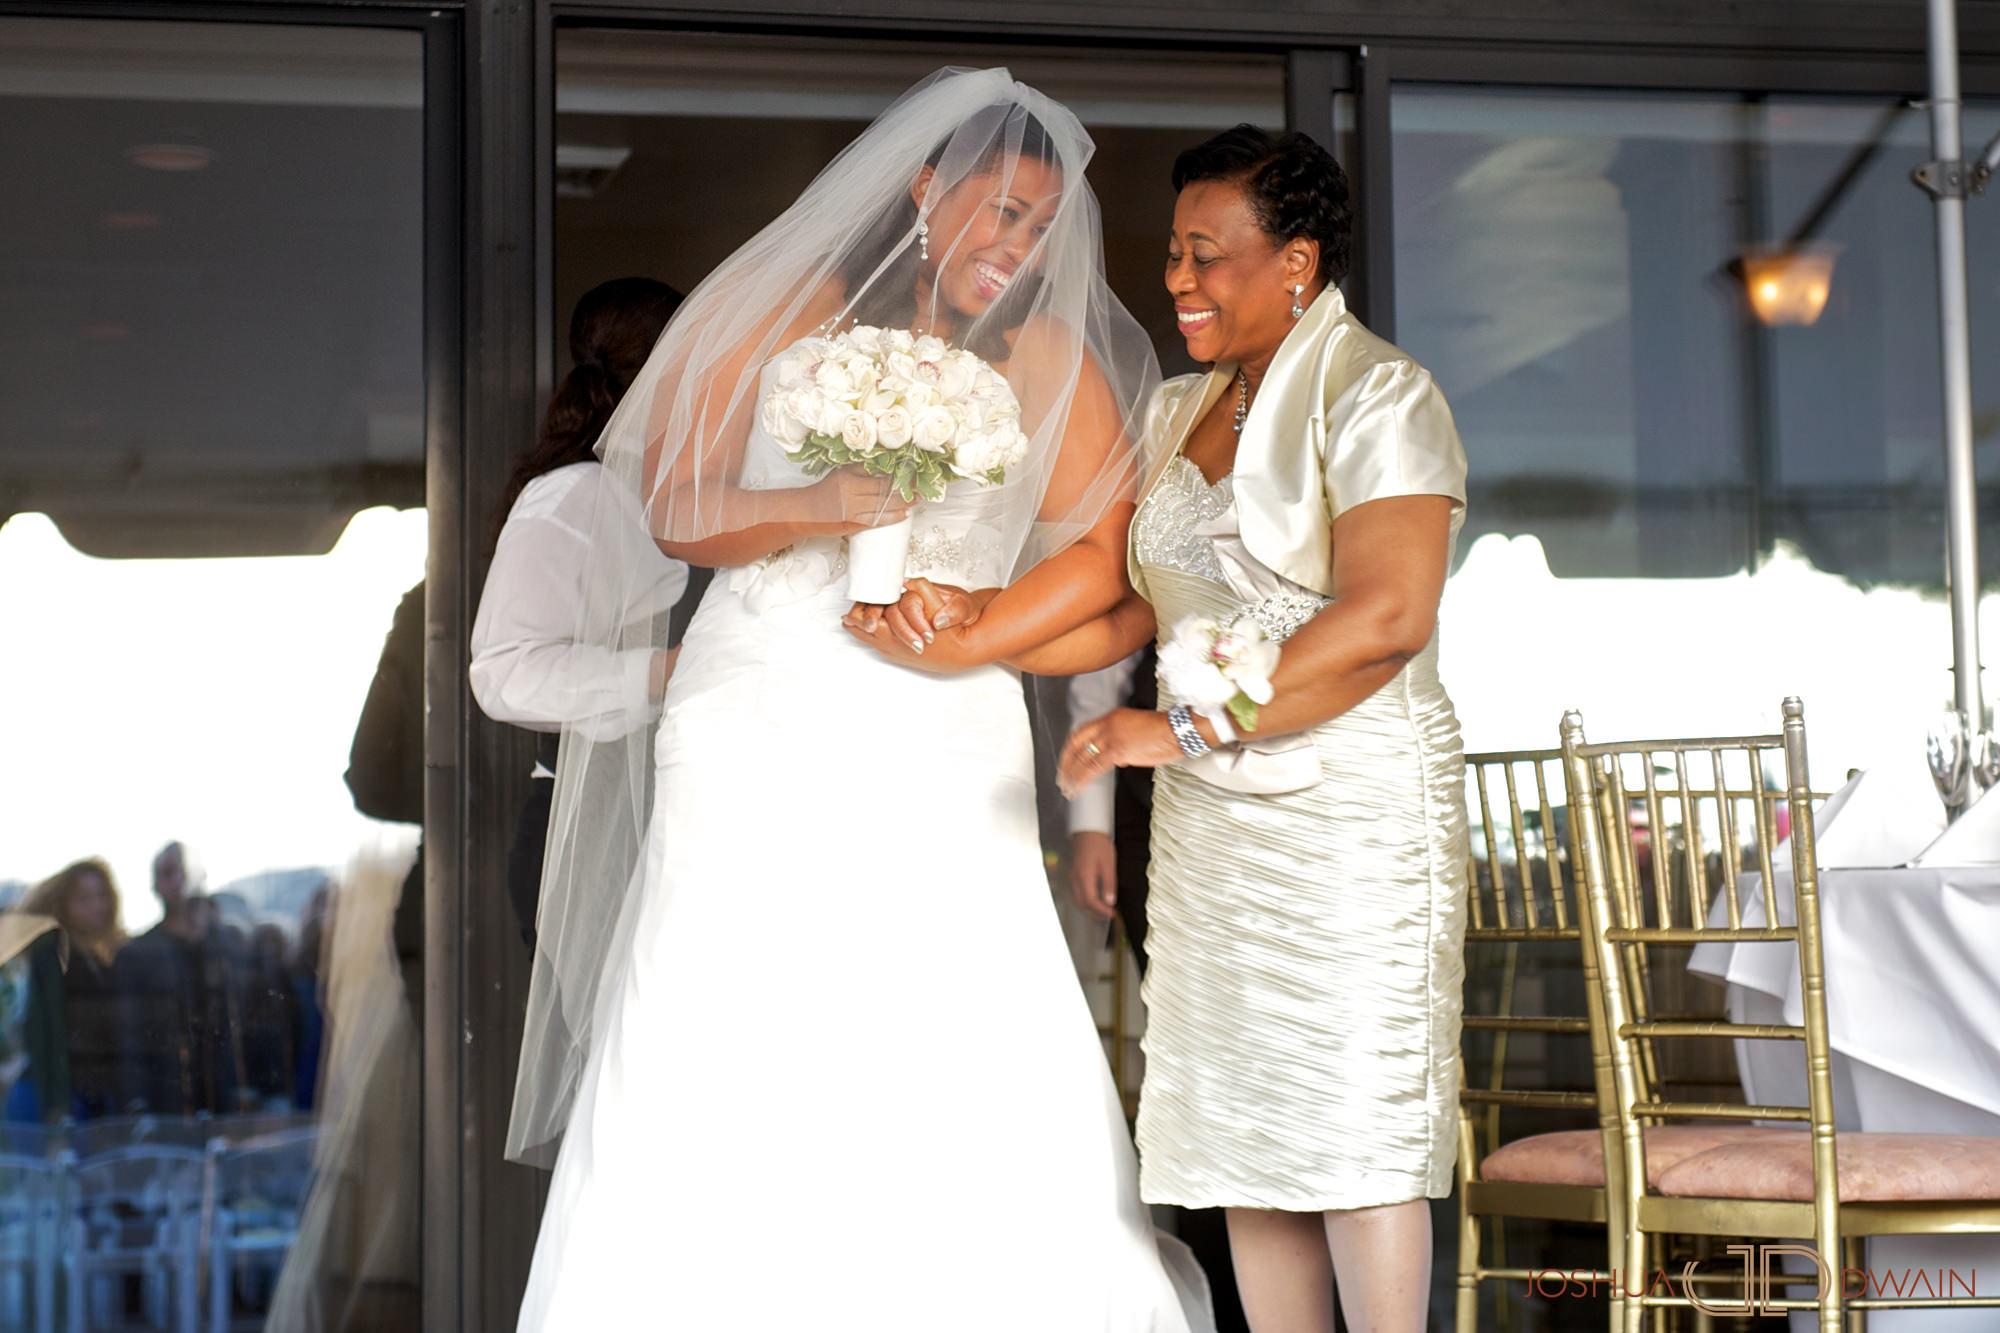 jessica-frank-015-giando-on-the-water-brooklyn-ny-wedding-photographer-joshua-dwain-2011-09-02_jf_311